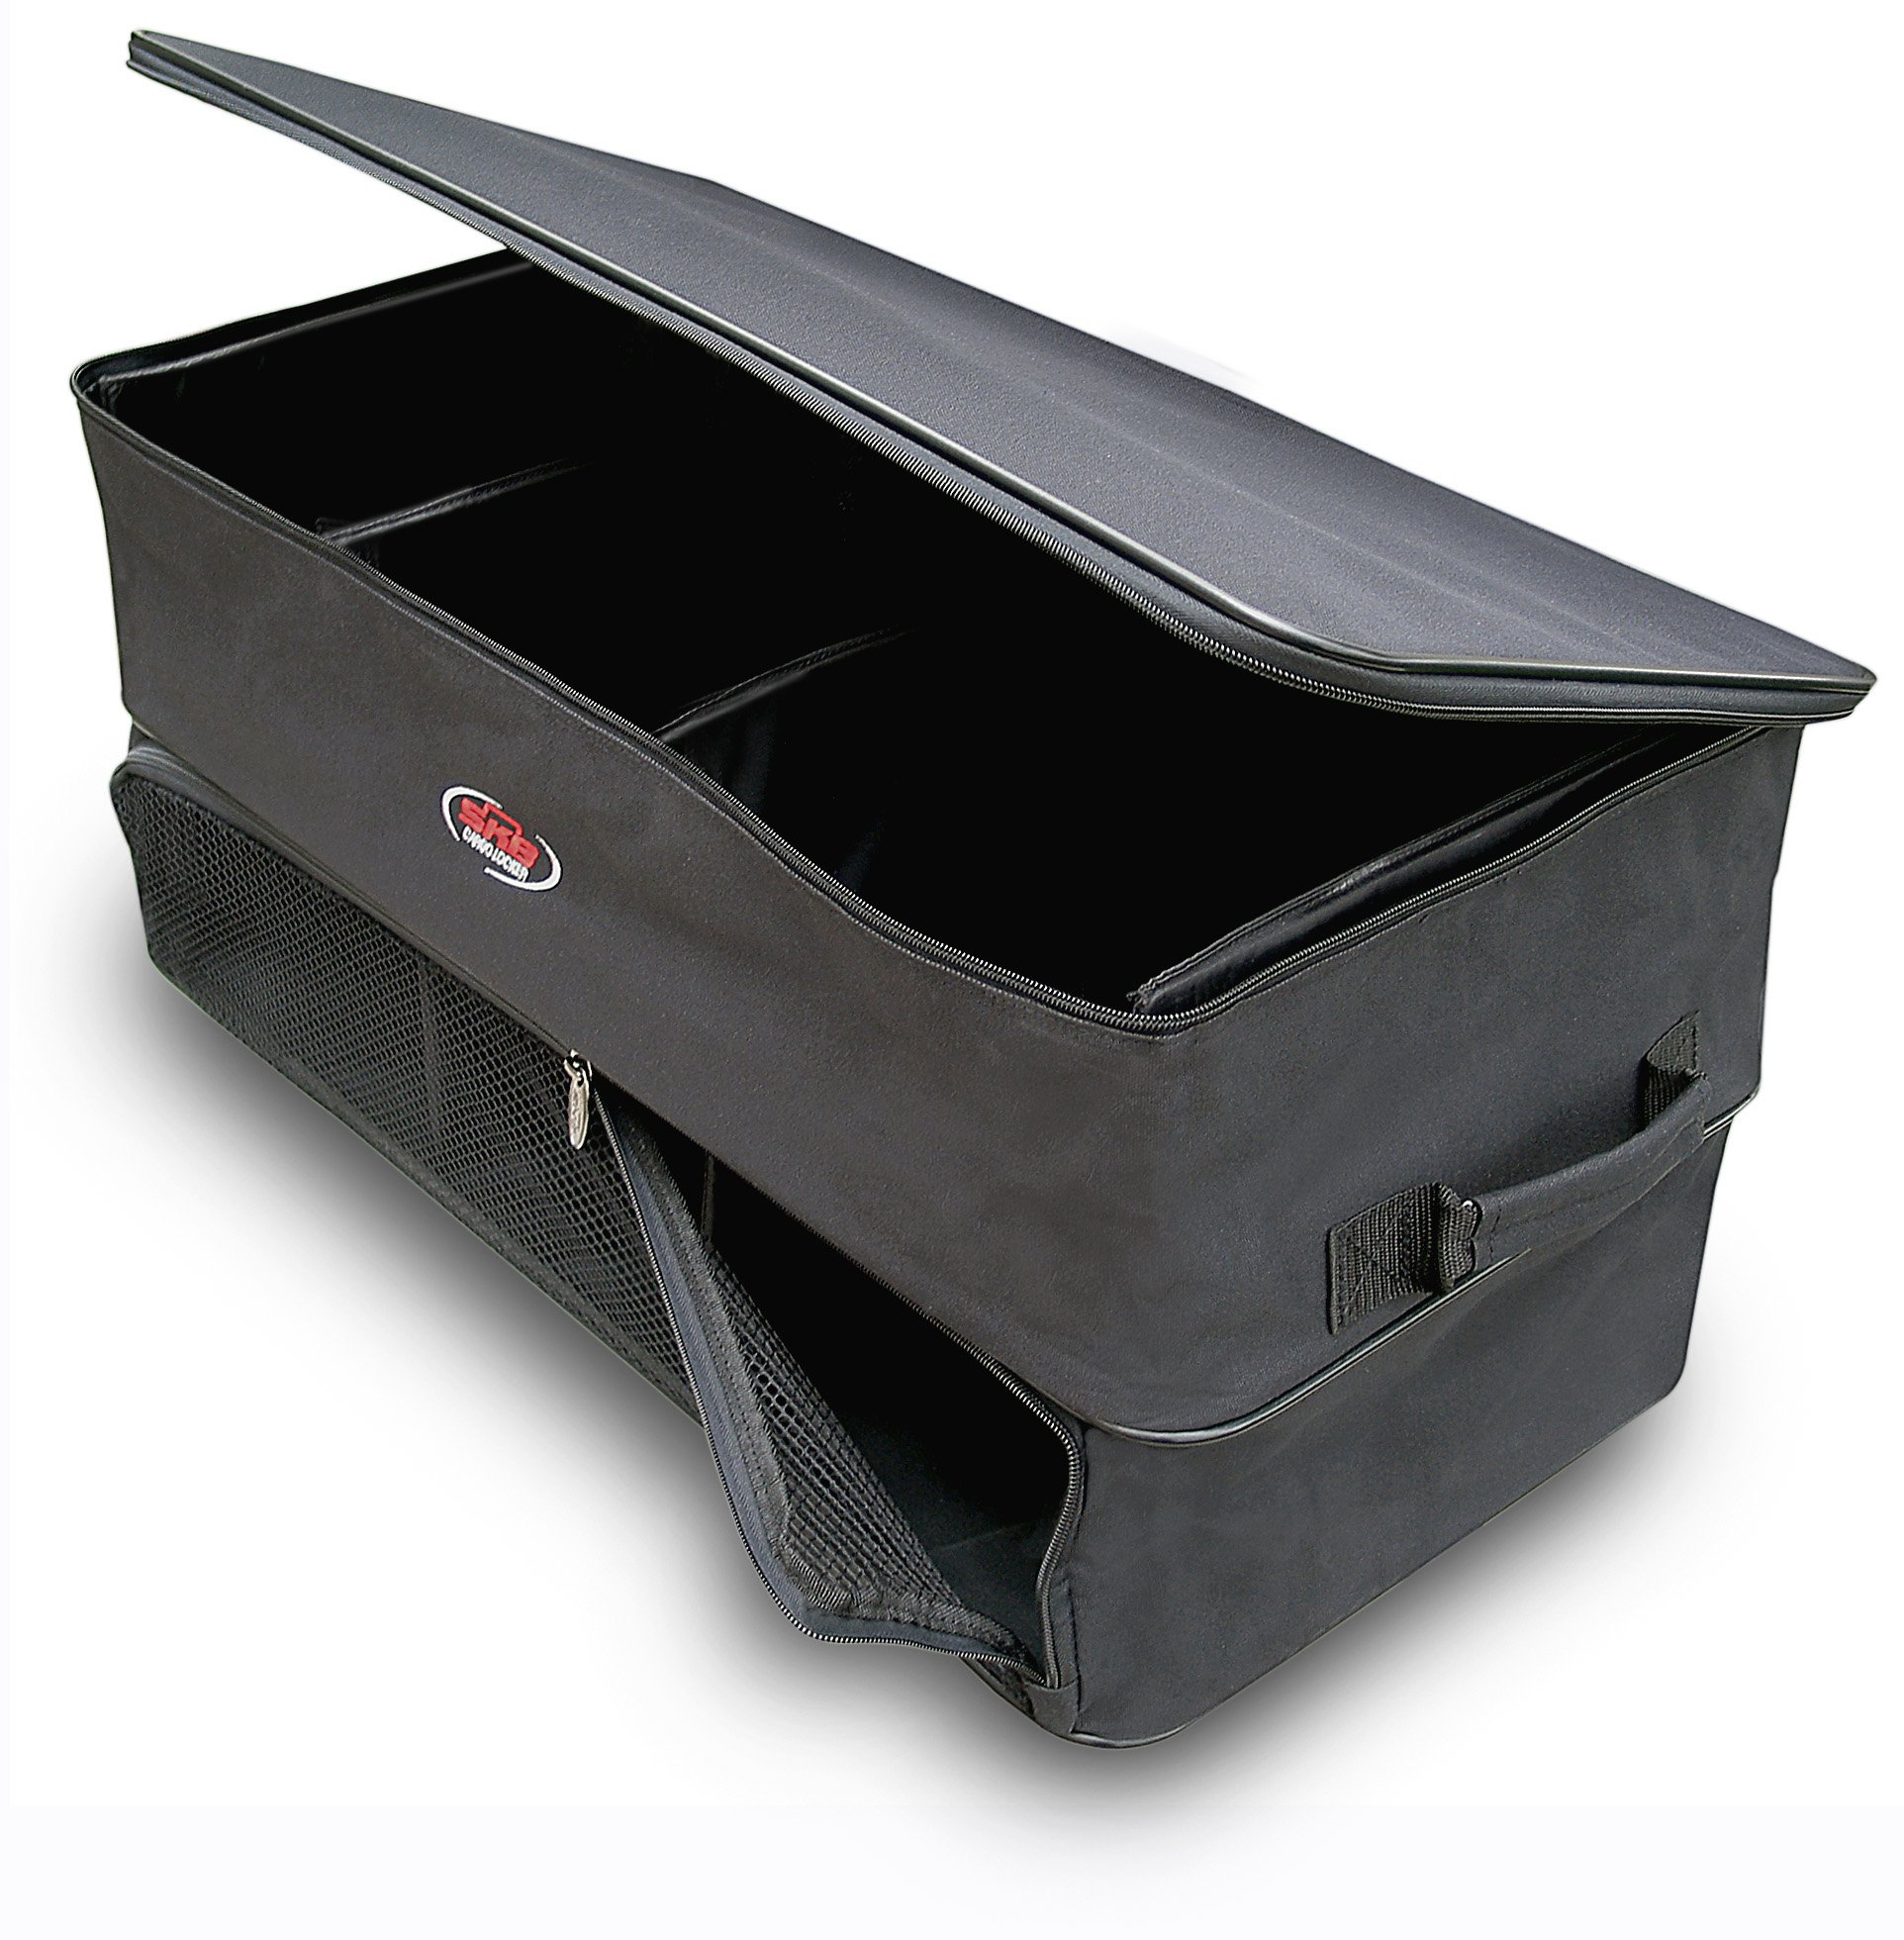 SKB Cargo Locker Golf Trunk Organizer (2SKB2714)